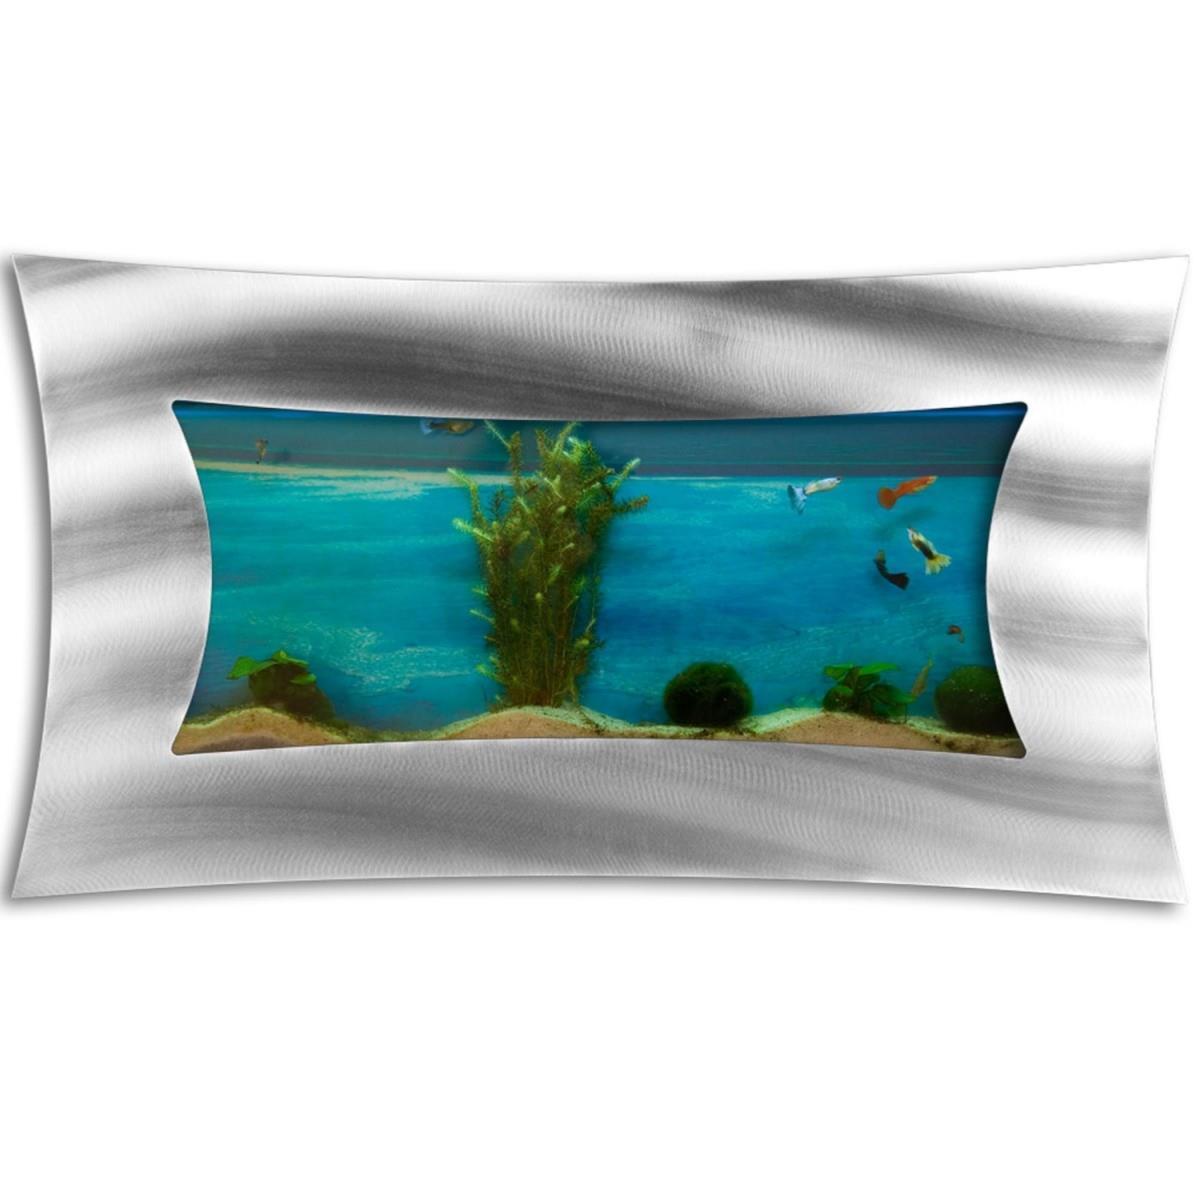 aquarium mural design 590x325x110 mm. Black Bedroom Furniture Sets. Home Design Ideas